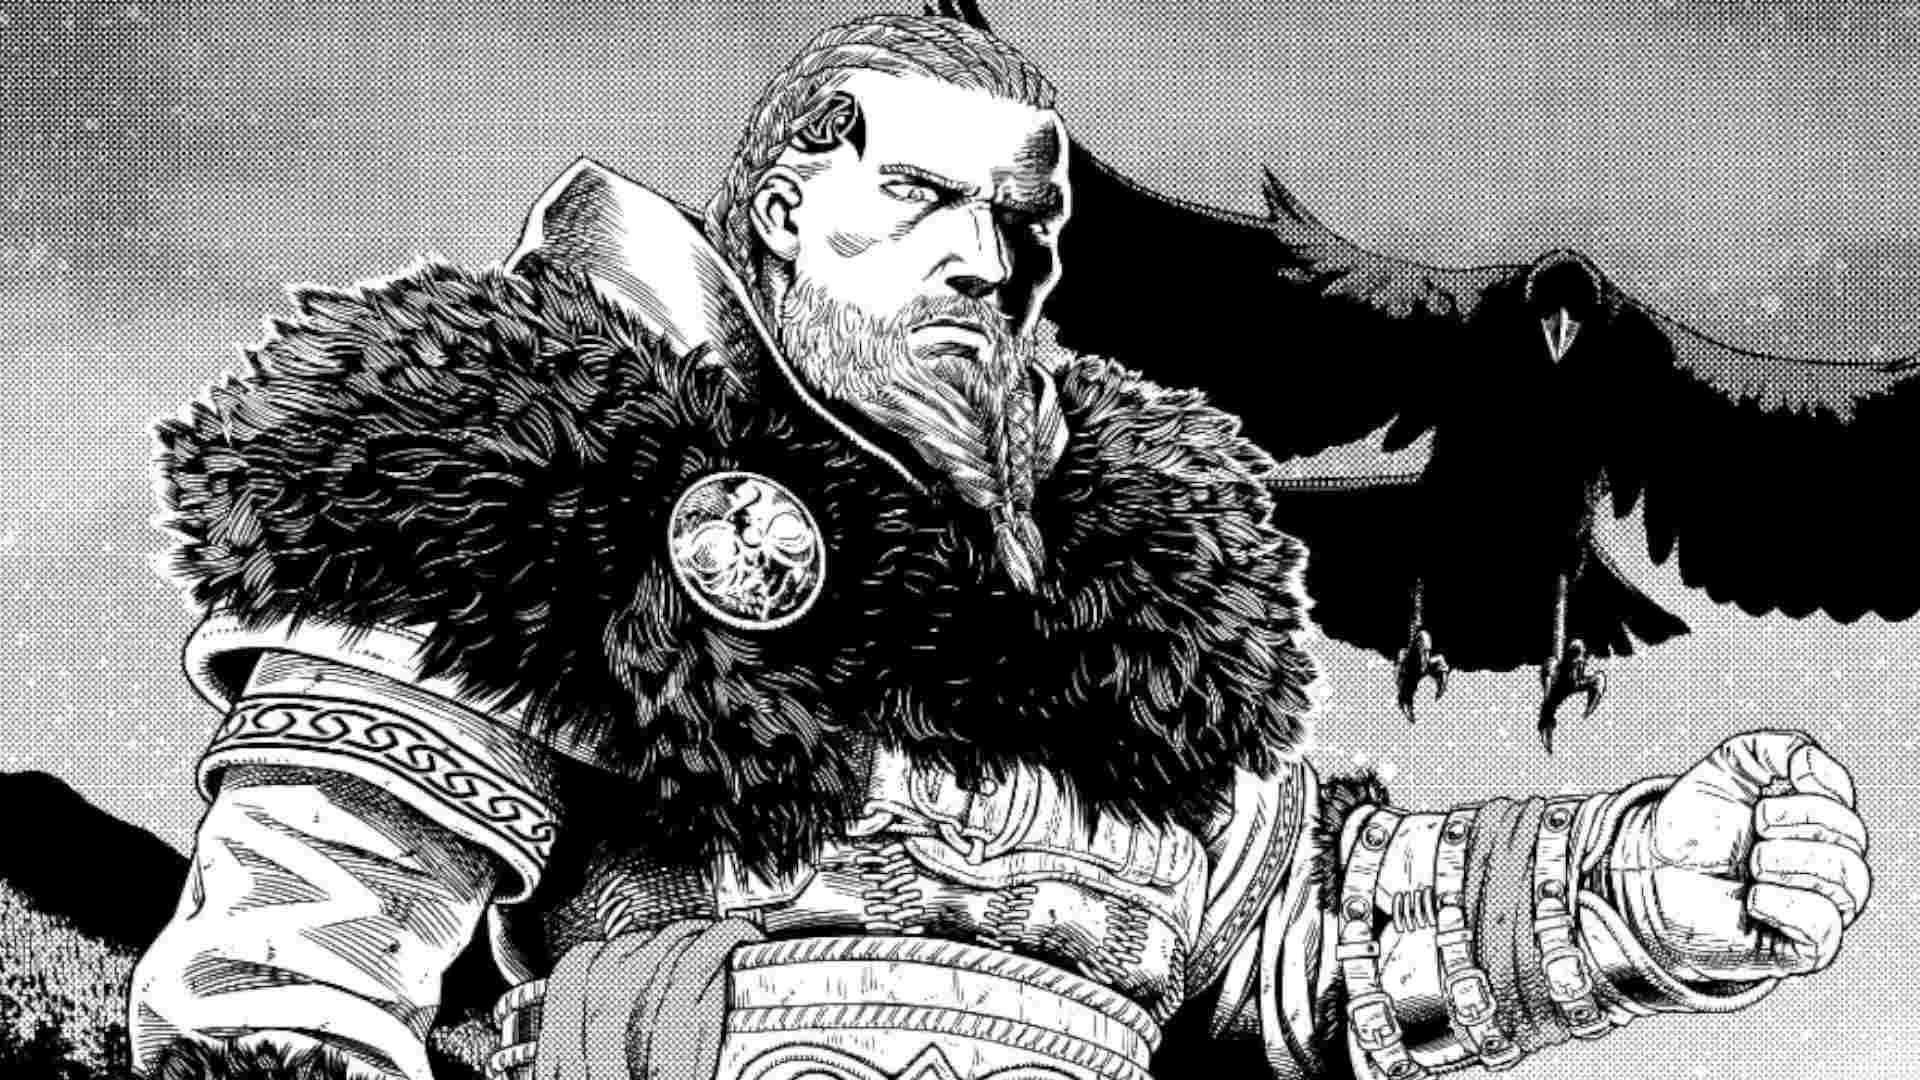 assassin's creed valhalla - vinland saga